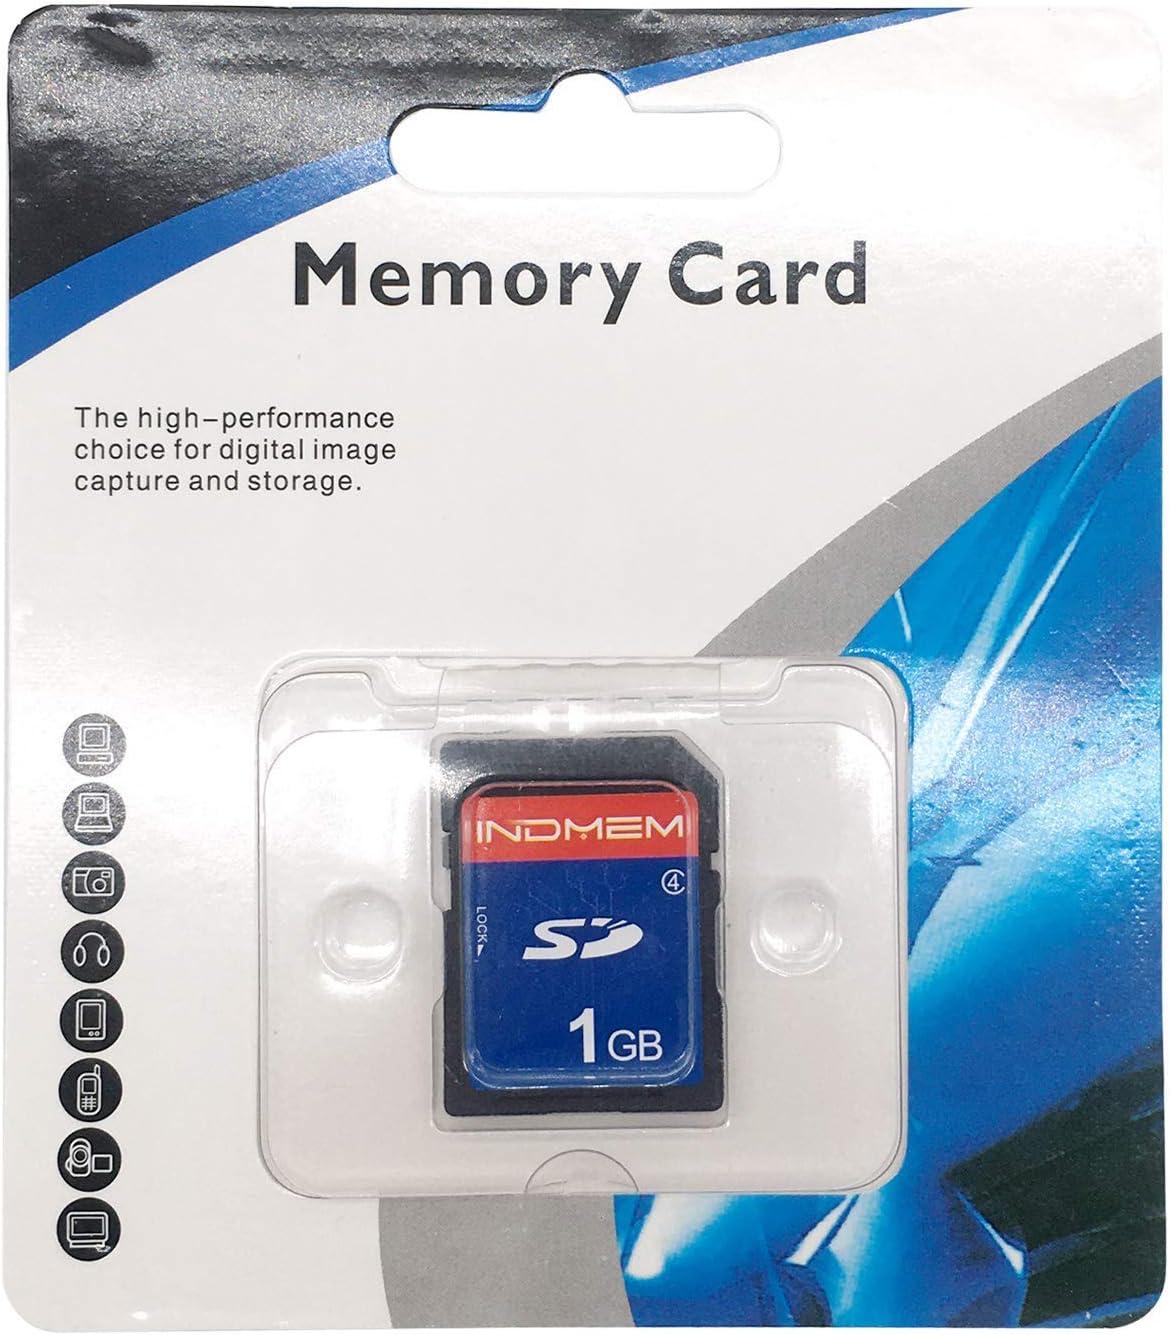 Indmem Sd Card 1gb Slc Secure Digital Flash Memory Card Computers Accessories